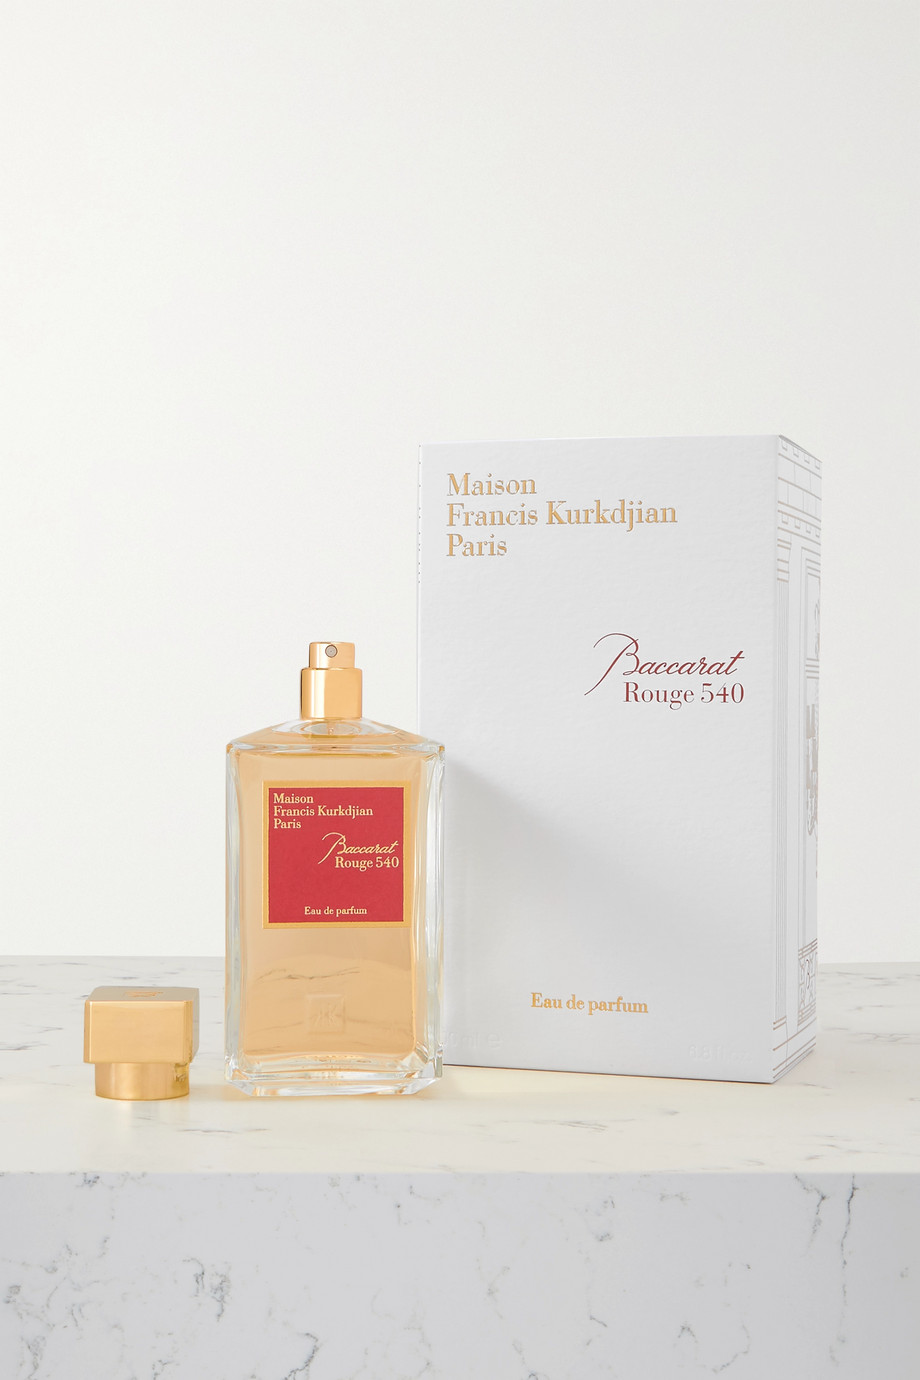 Maison Francis Kurkdjian Baccarat Rouge 540, 200 ml – Eau de Parfum